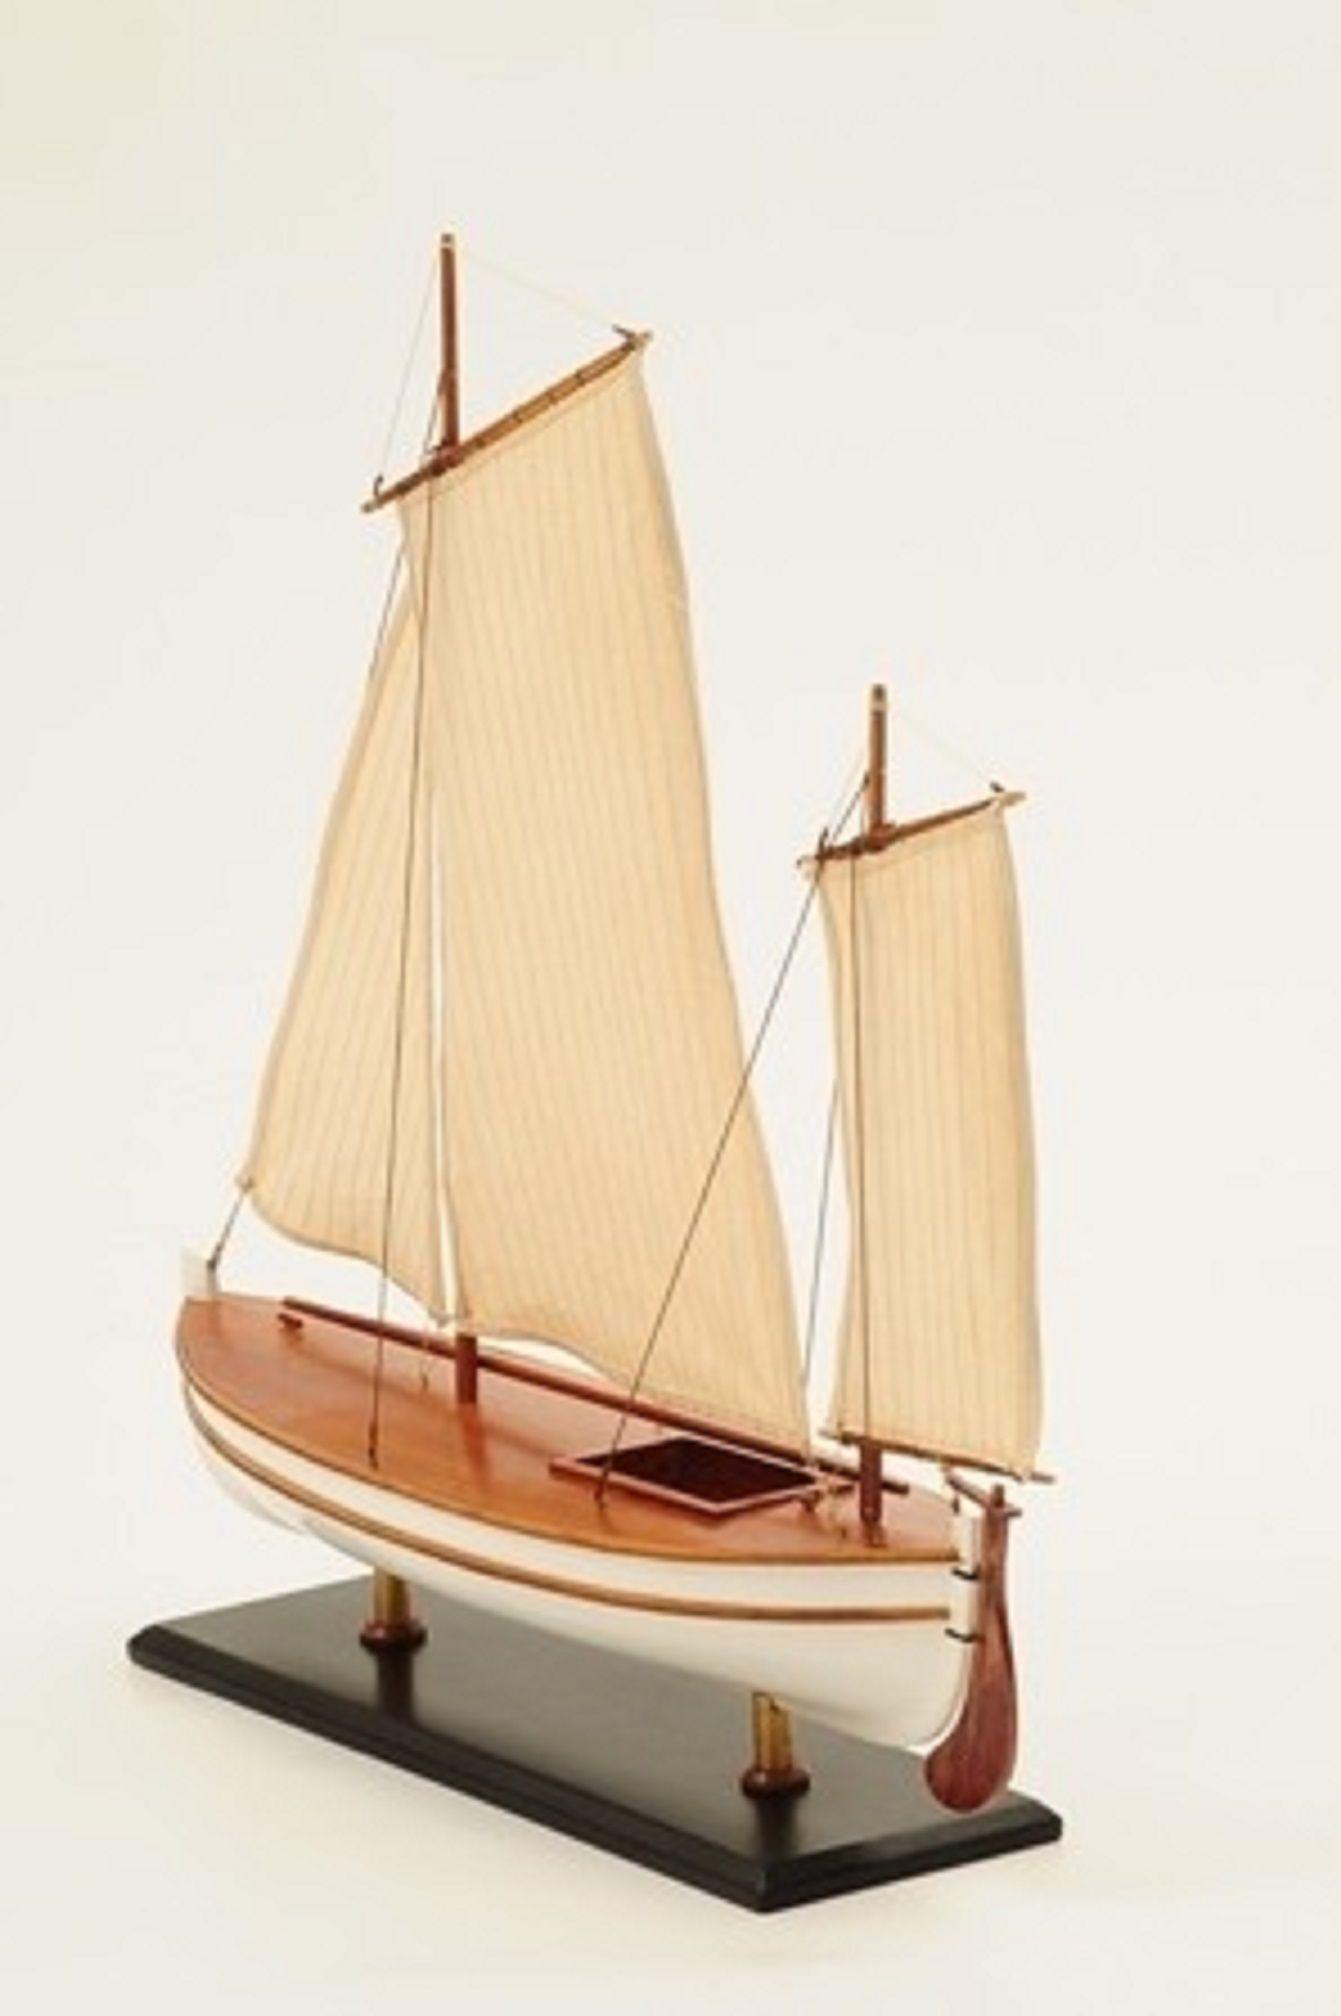 1195-7052-James-Caird-Lifeboat-HMS-Endurance